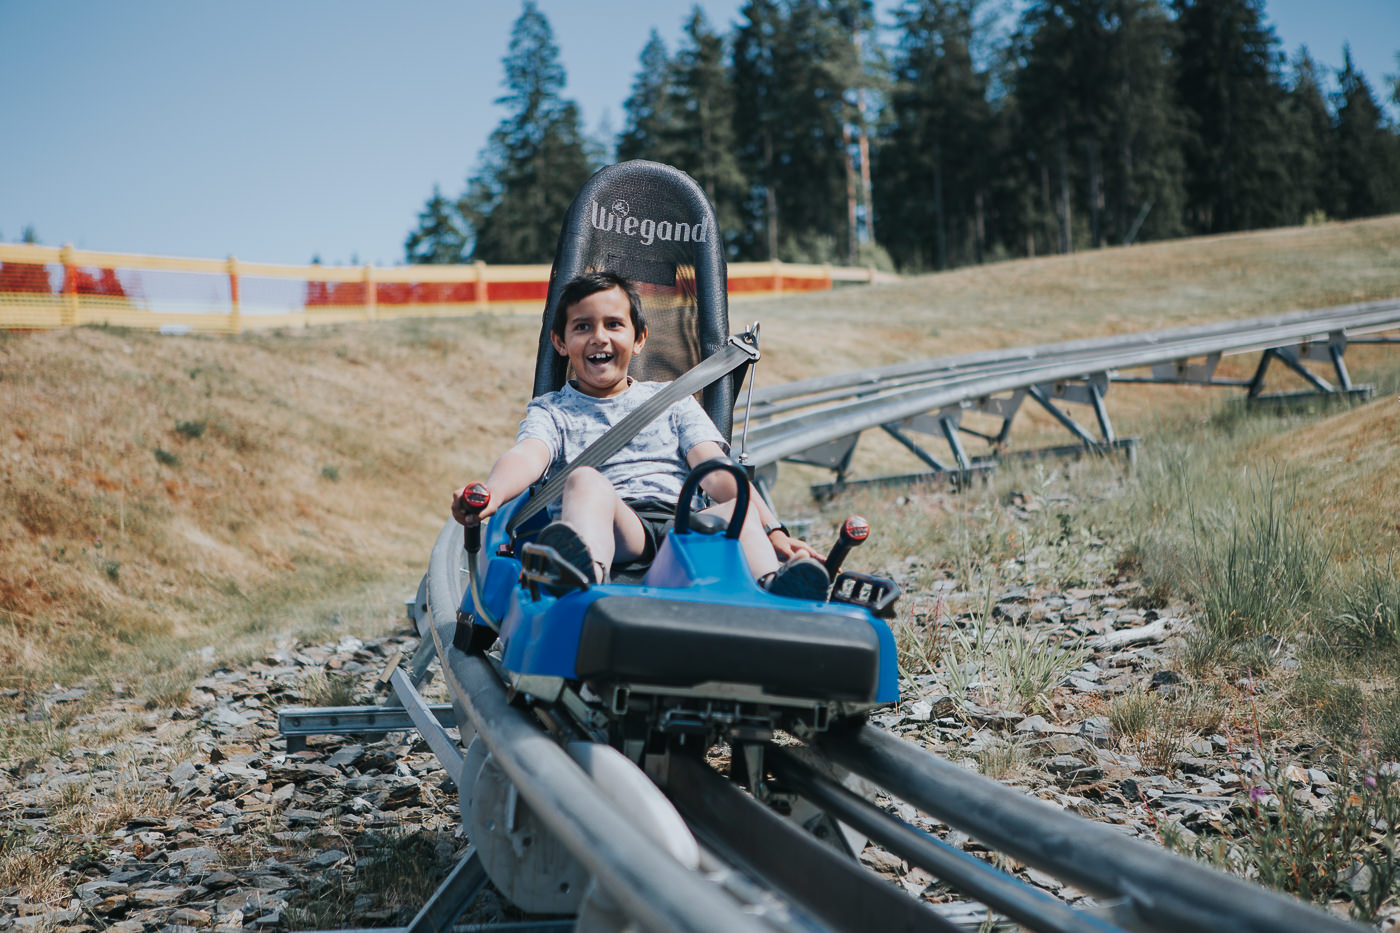 kid on summer sled - high speed fun